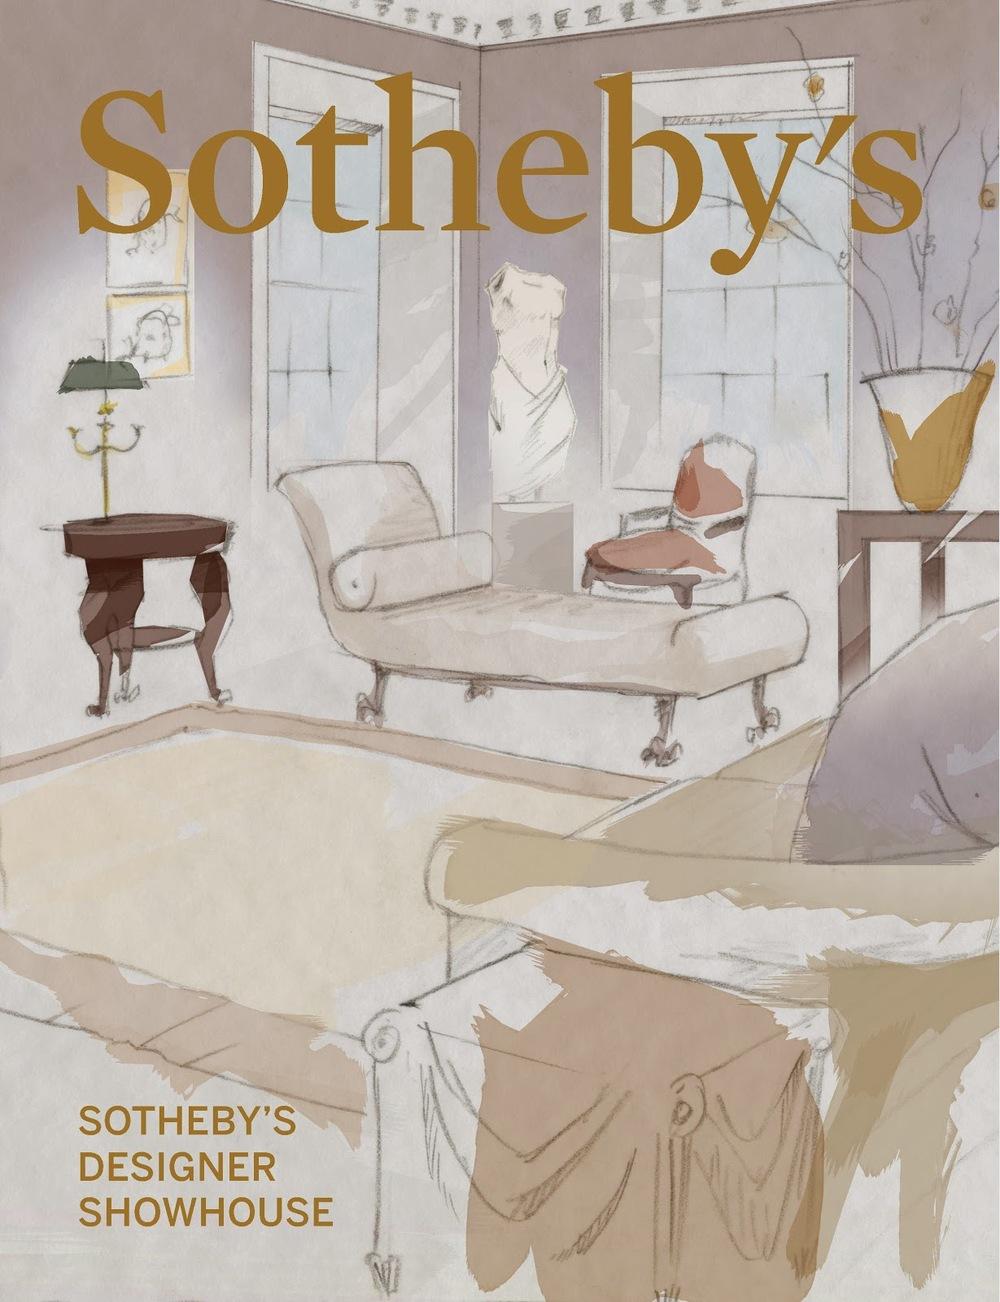 Sothebys+cover.jpg